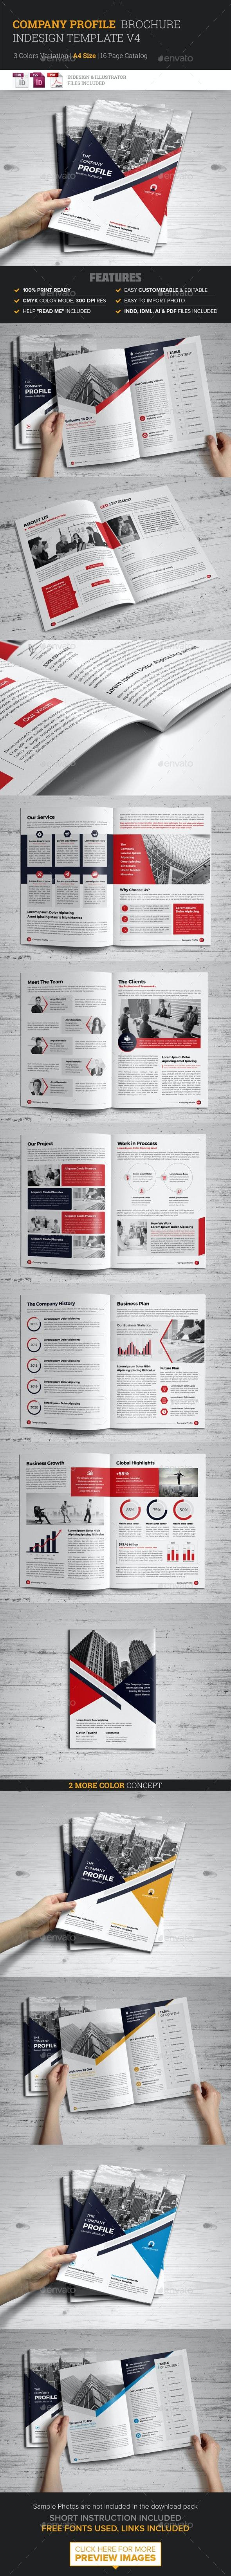 Company Profile Brochure Template v4 - Brochures Print Templates